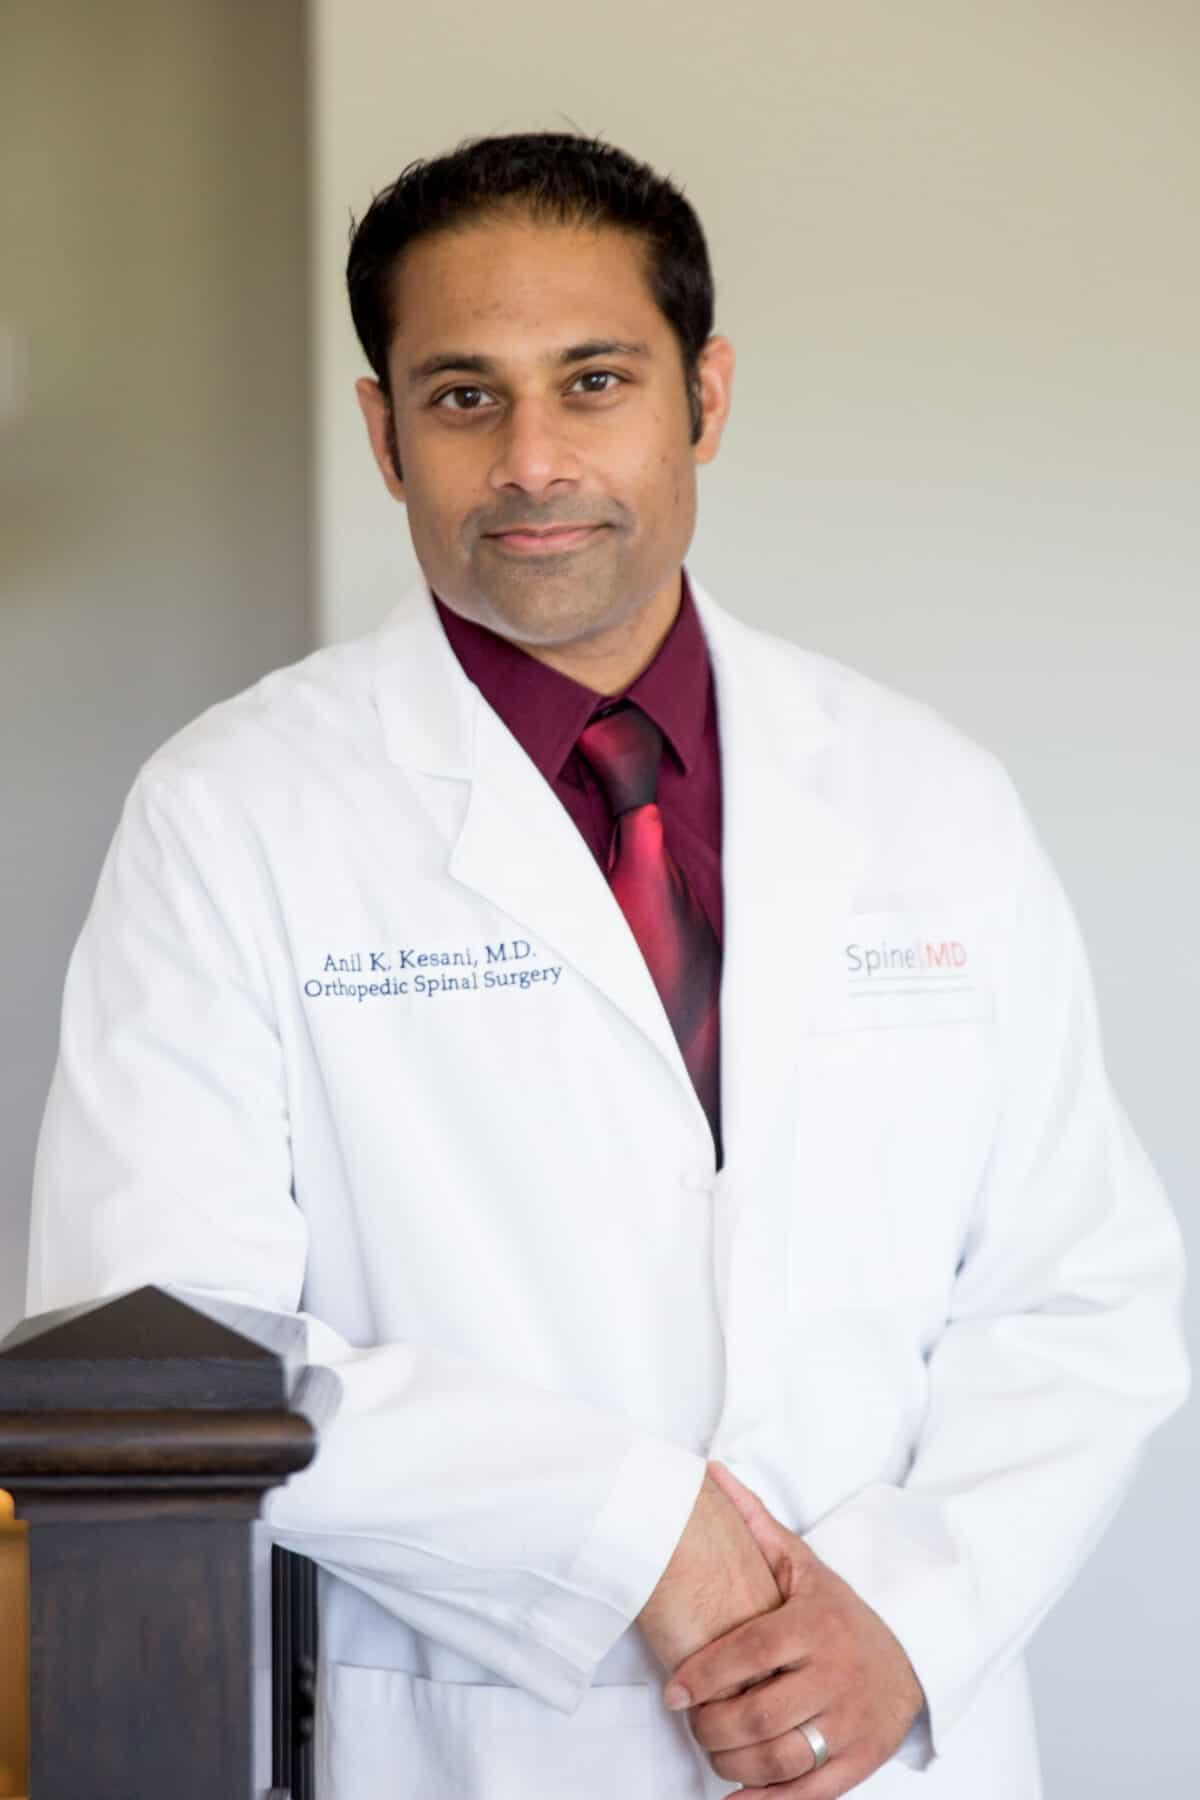 Anil Kesani MD